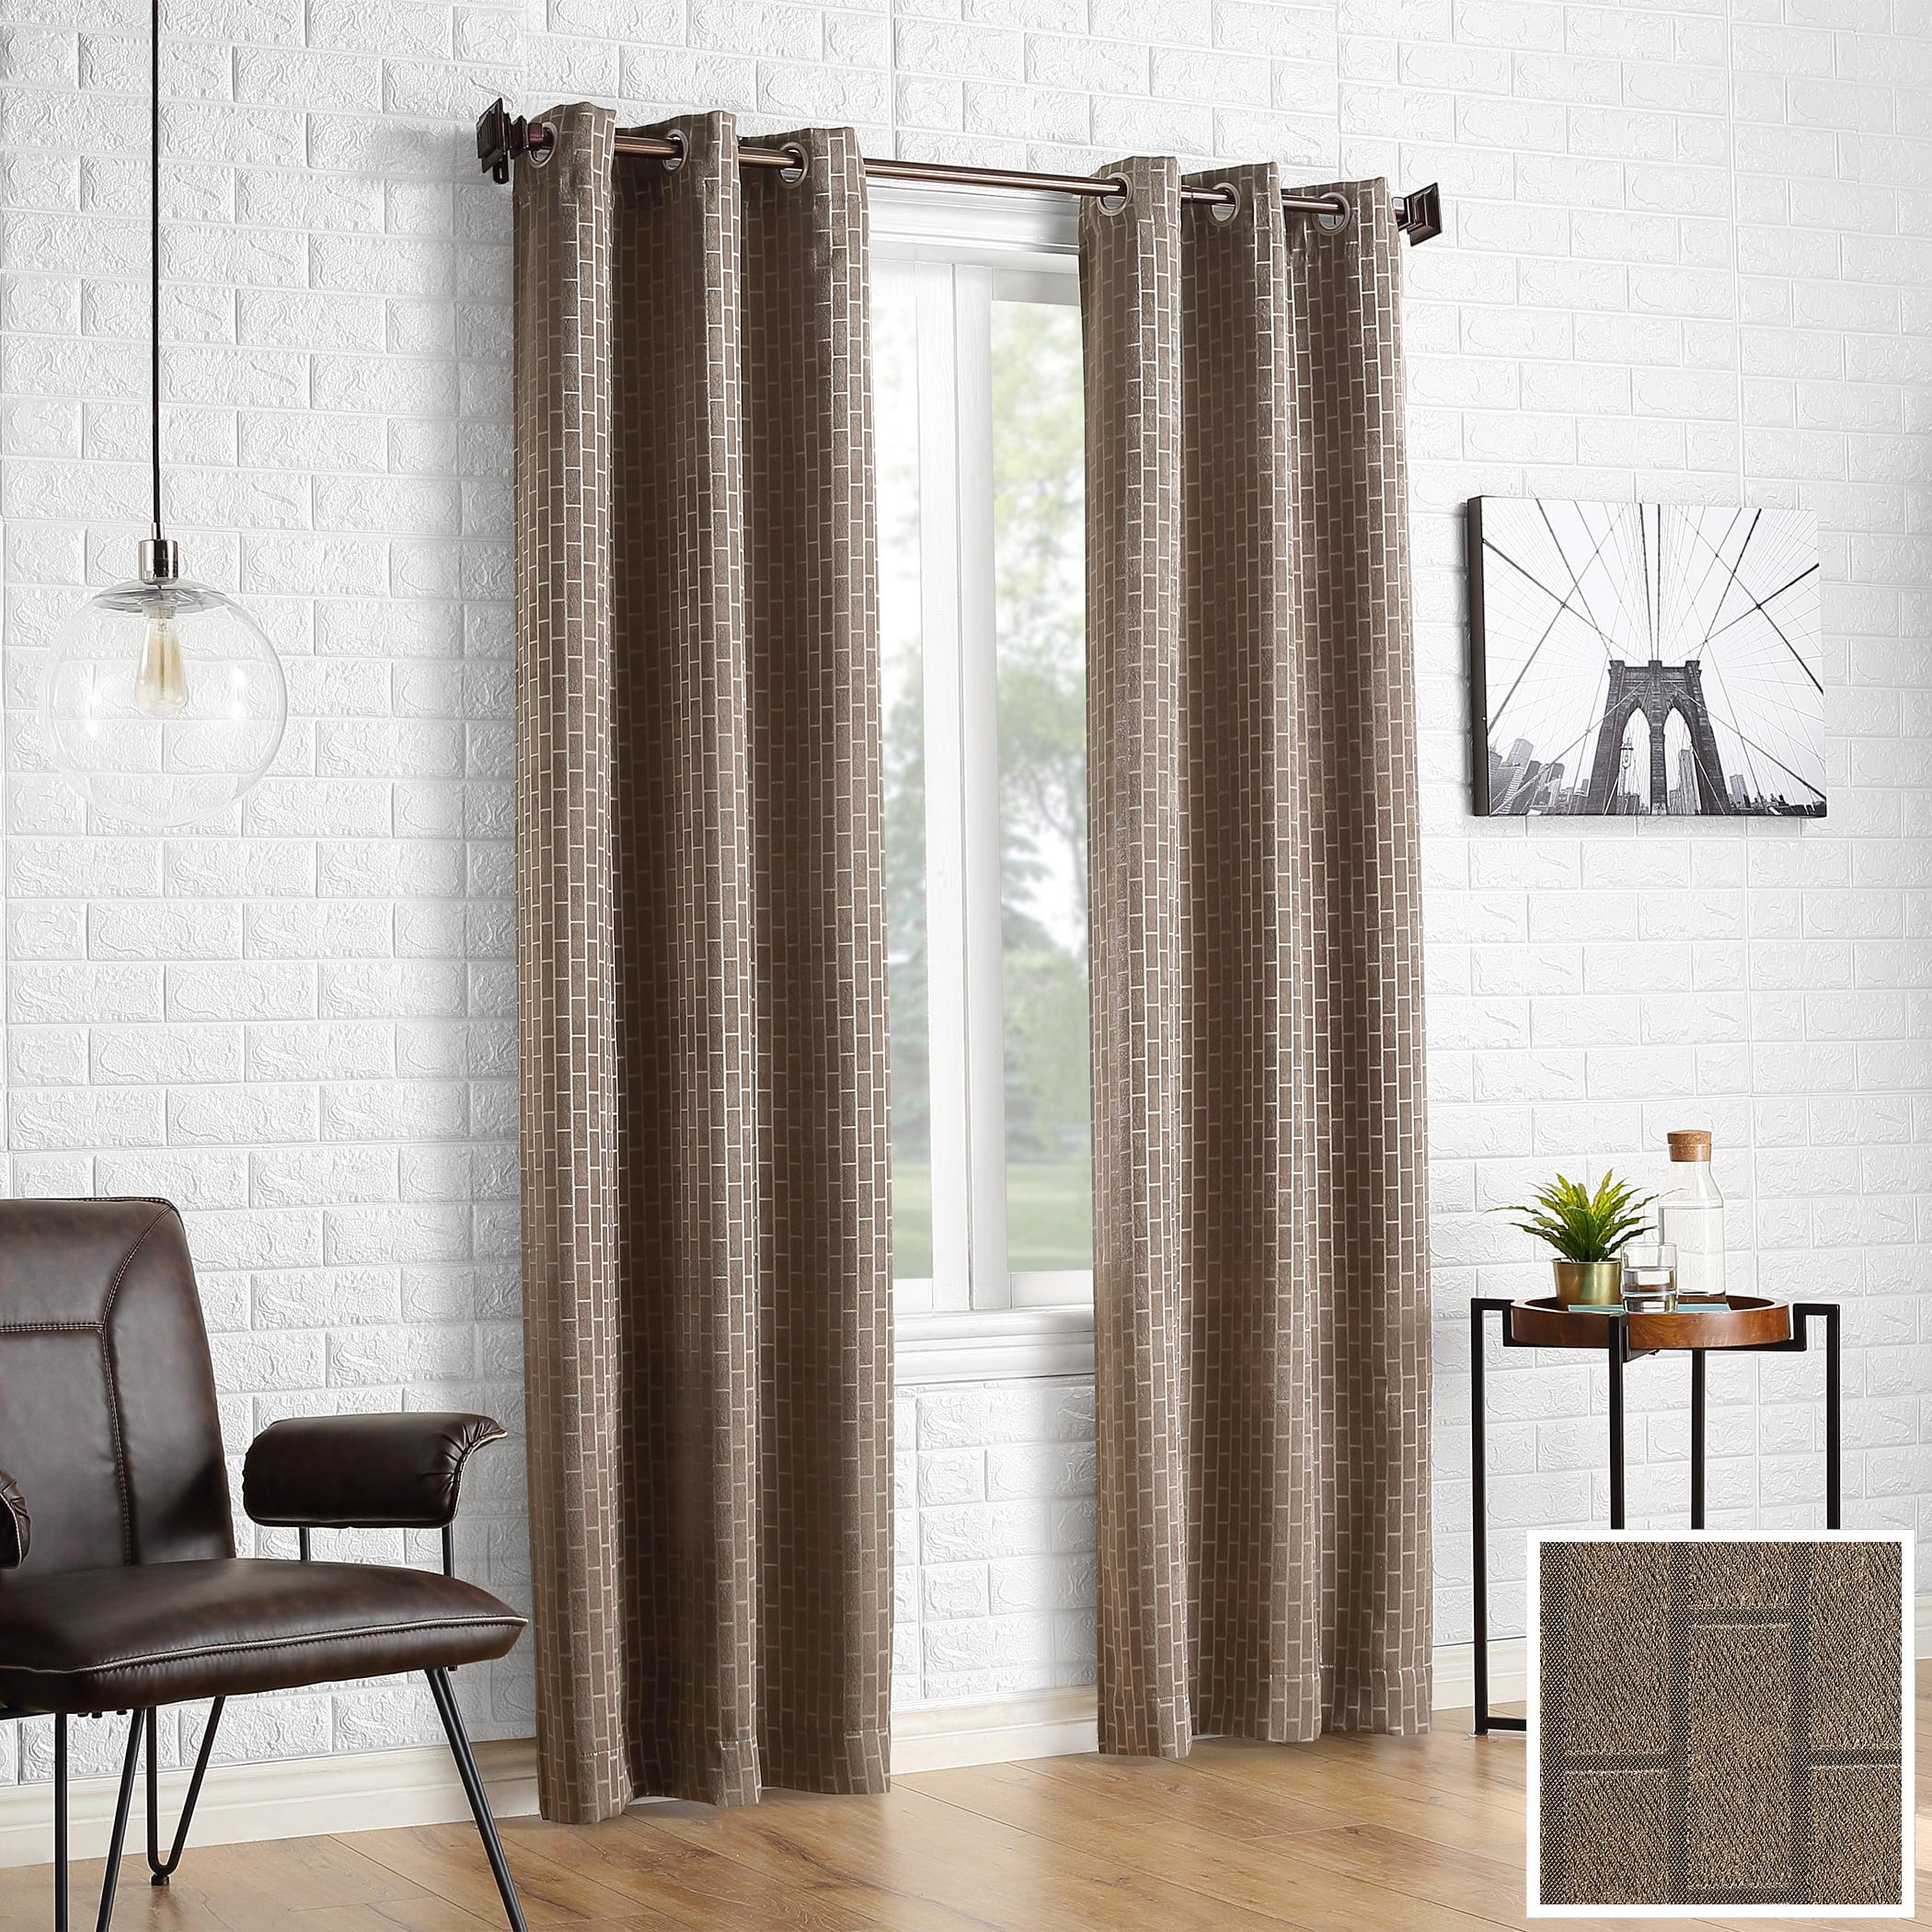 Sun Zero 2-pack Stockton Tile Jacquard Blackout Grommet Curtain Panel Pair